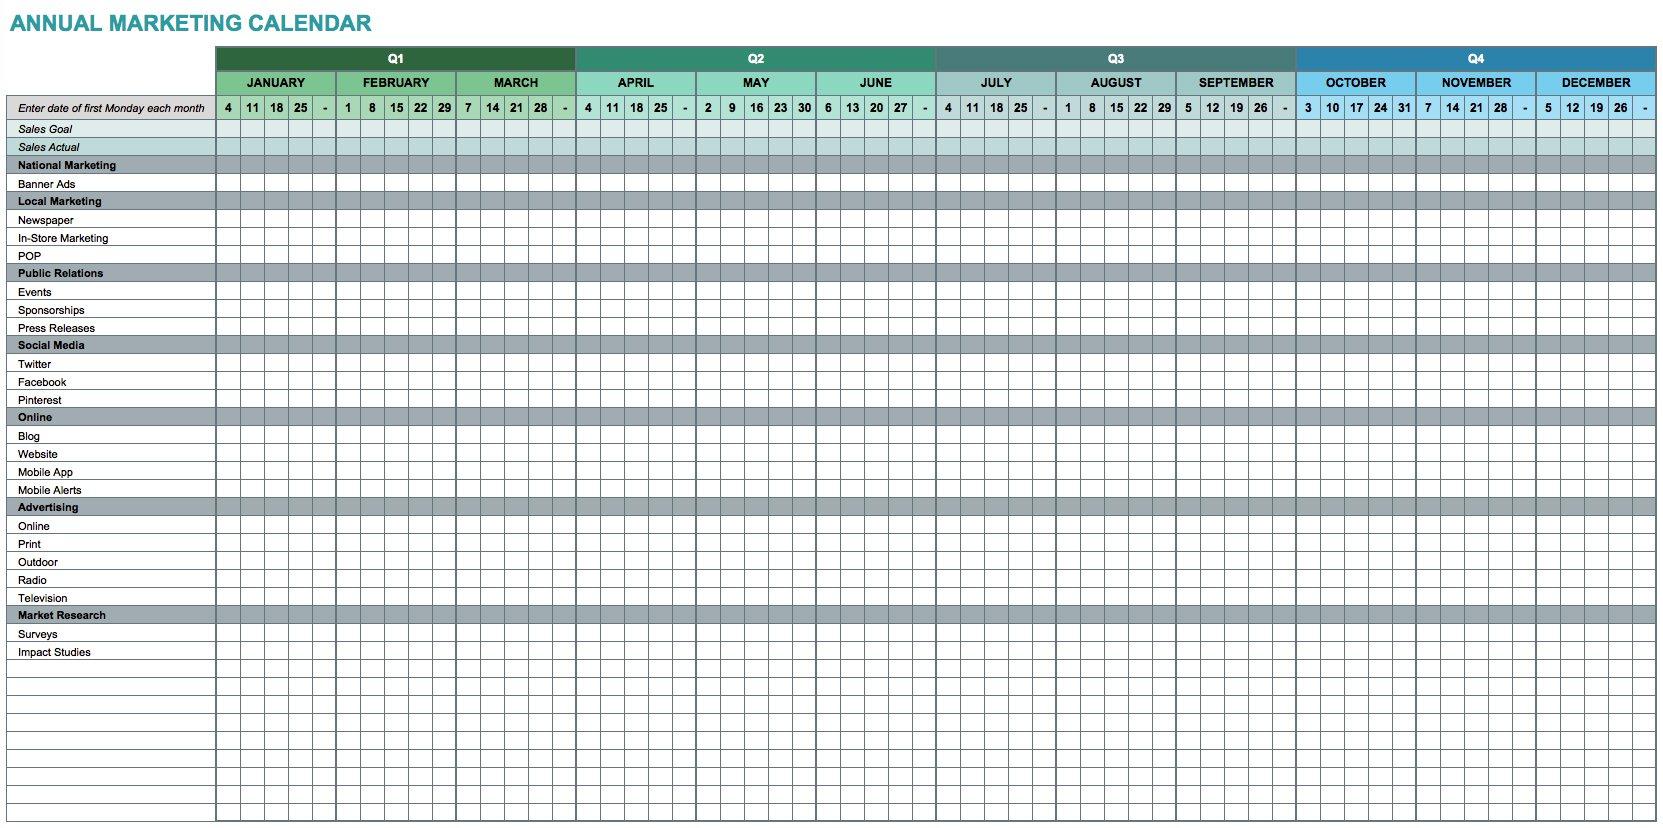 9 Free Marketing Calendar Templates For Excel - Smartsheet for Annual Calendar Template Excel